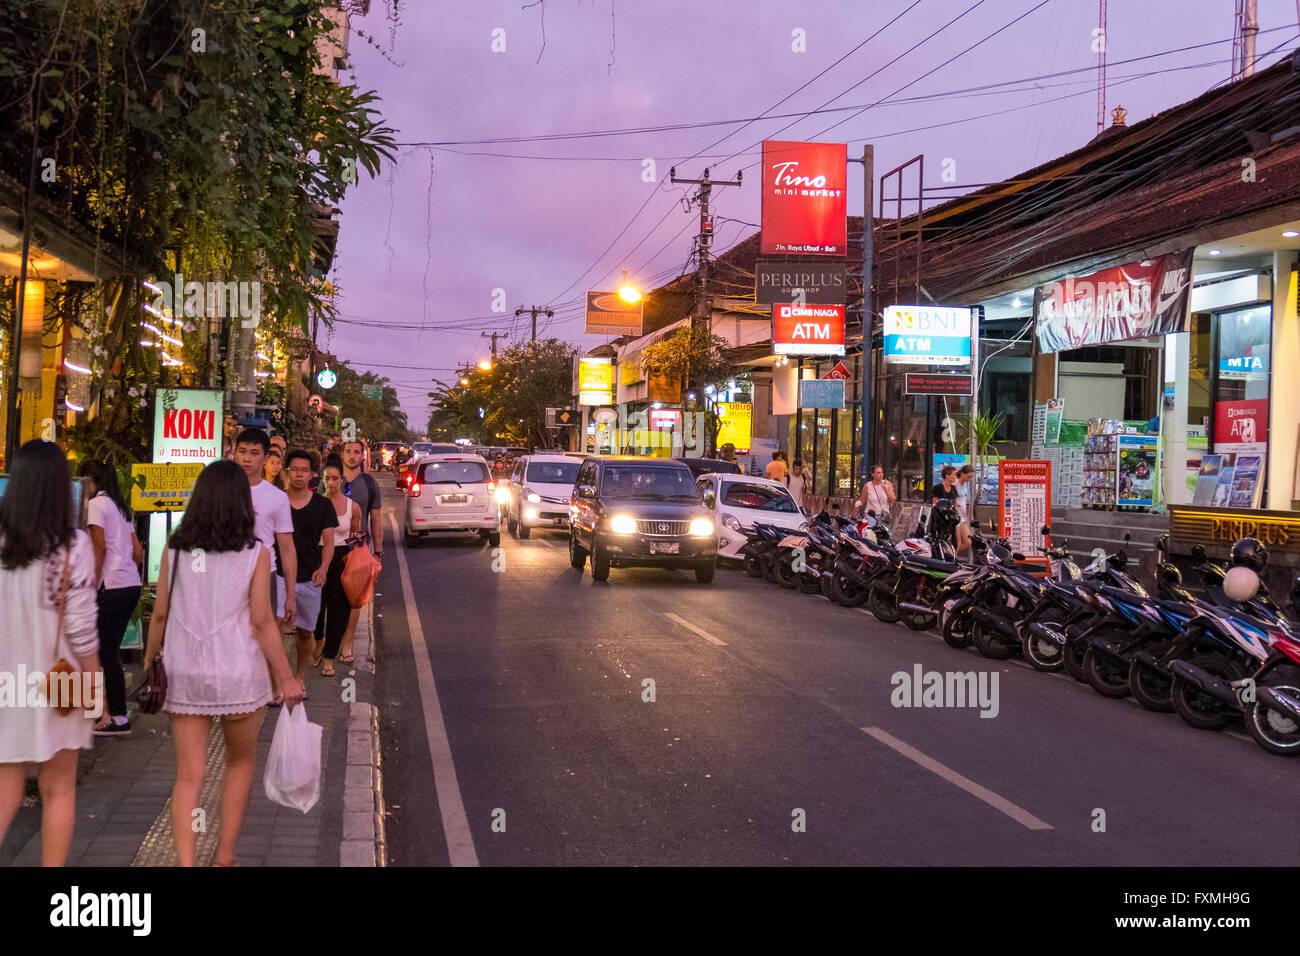 Street View of Ubud, Bali, Indonesia Stock Photo: 102485532  Alamy